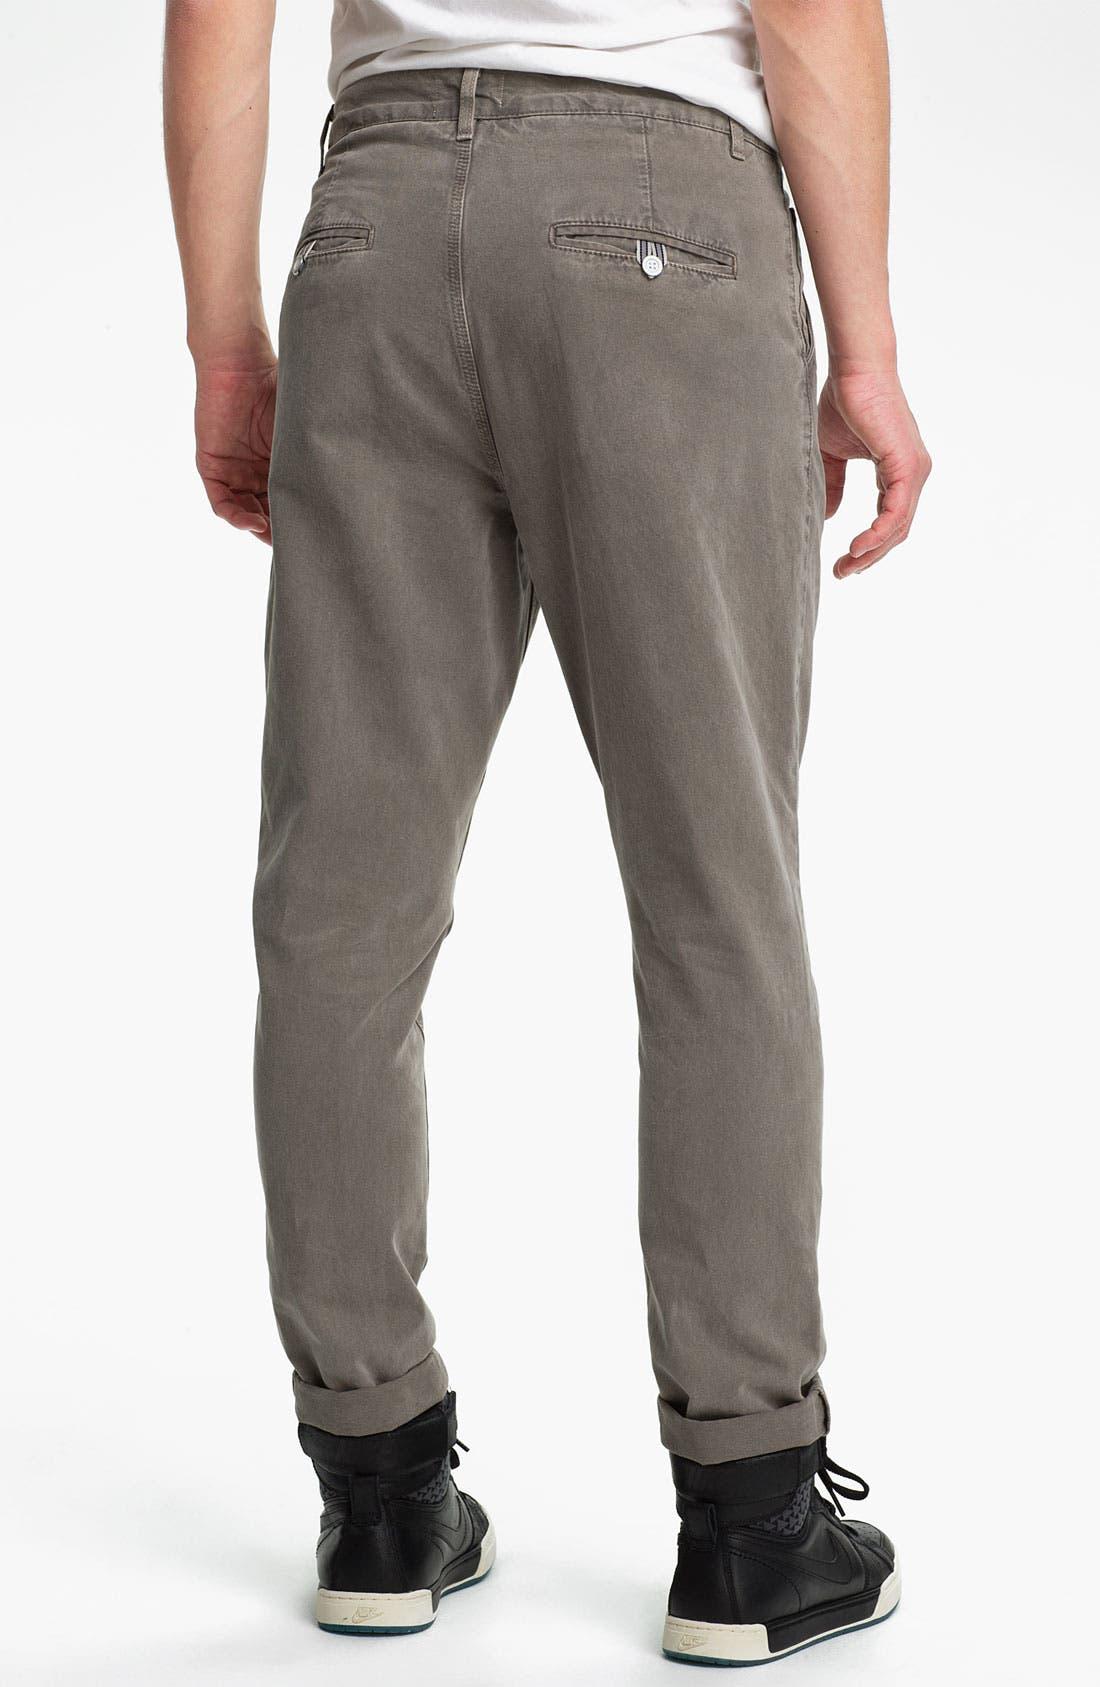 Skinny Carrot Fit Pants,                             Alternate thumbnail 2, color,                             030